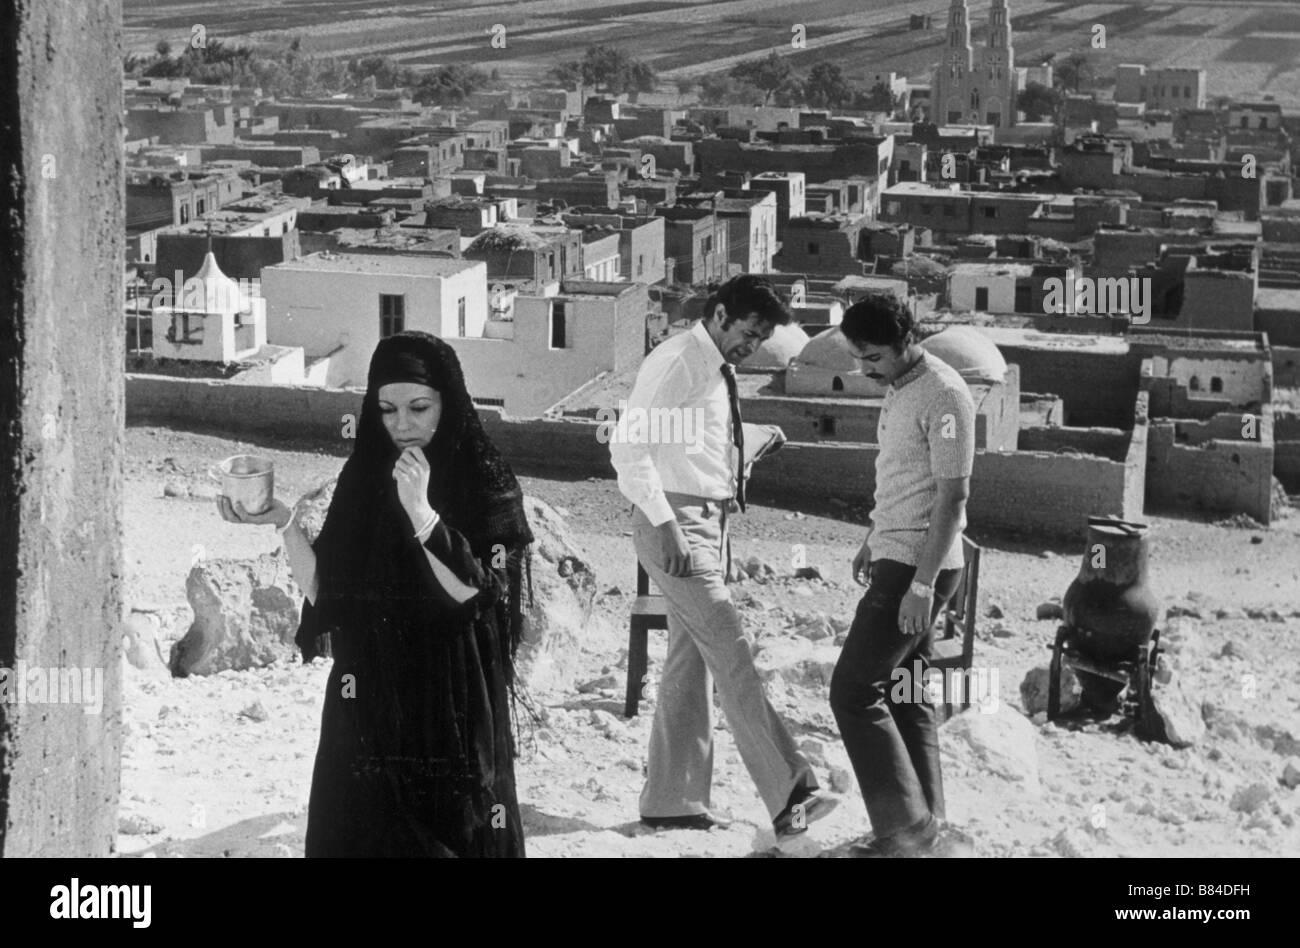 Moineau, Le Asfour, al- (1972) Egypt | Algeria Mohsena Tewfik, Salah Kabil, Seif  El Dine Director: Youssef Chahine